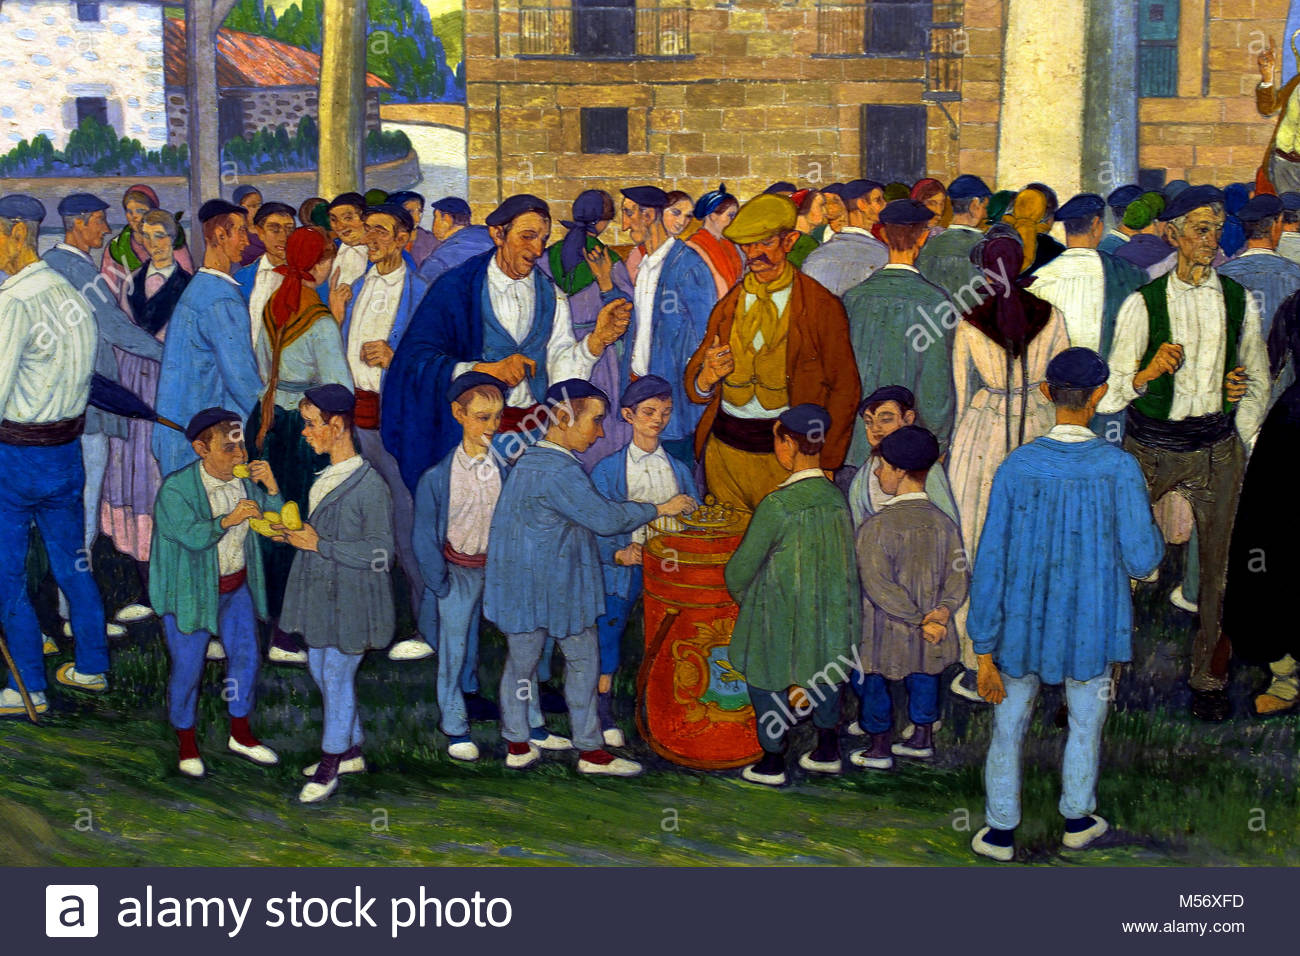 Village Festival in the Square 1922 Jose Arrue, 1885-1977, 20th century, Bilbao, Spanish,Spain. - Stock Image